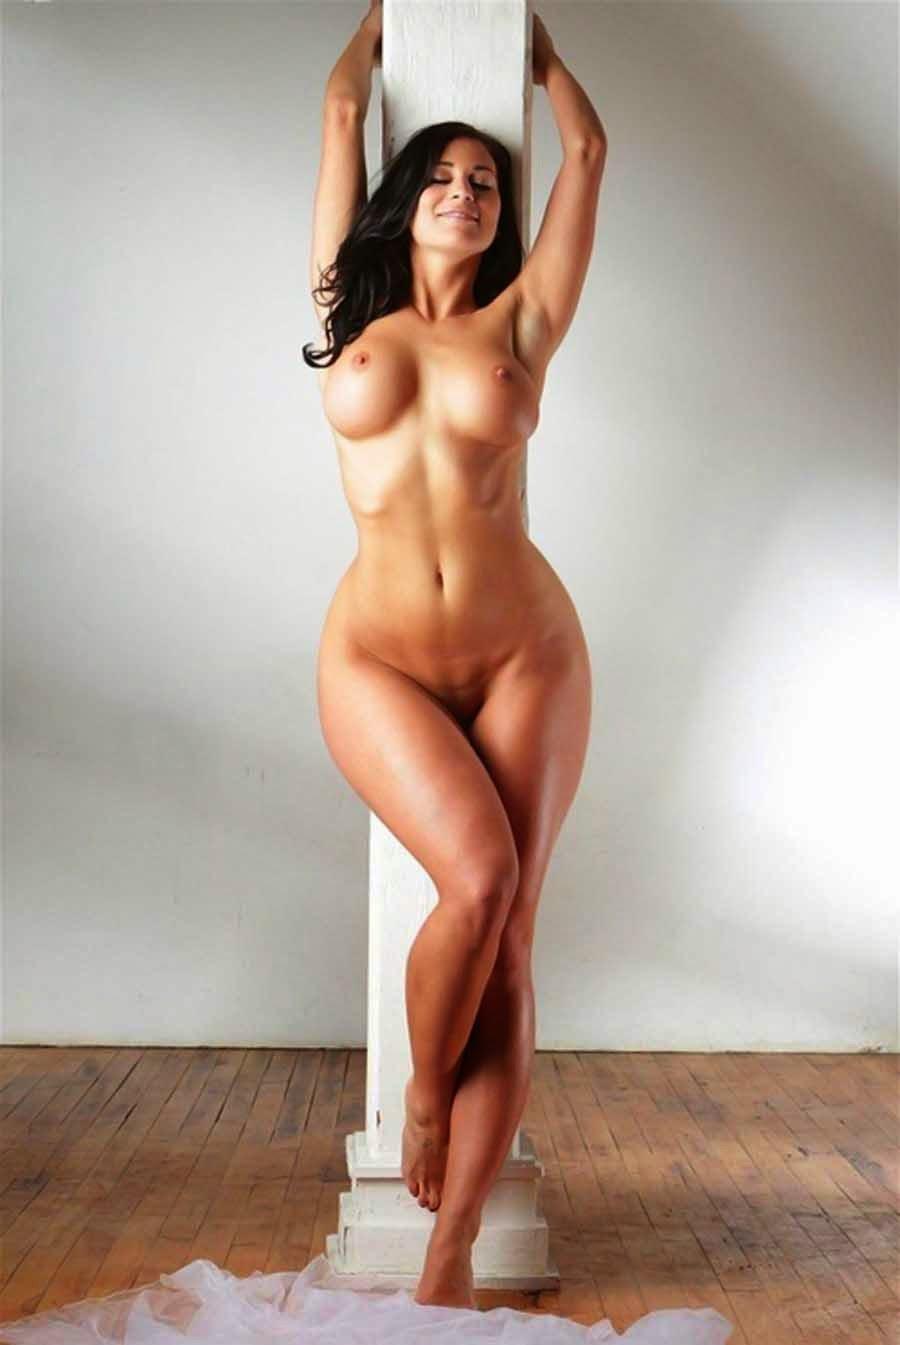 Voluptuous Nude Girls Non-Asian  Gravuregirlz-7886